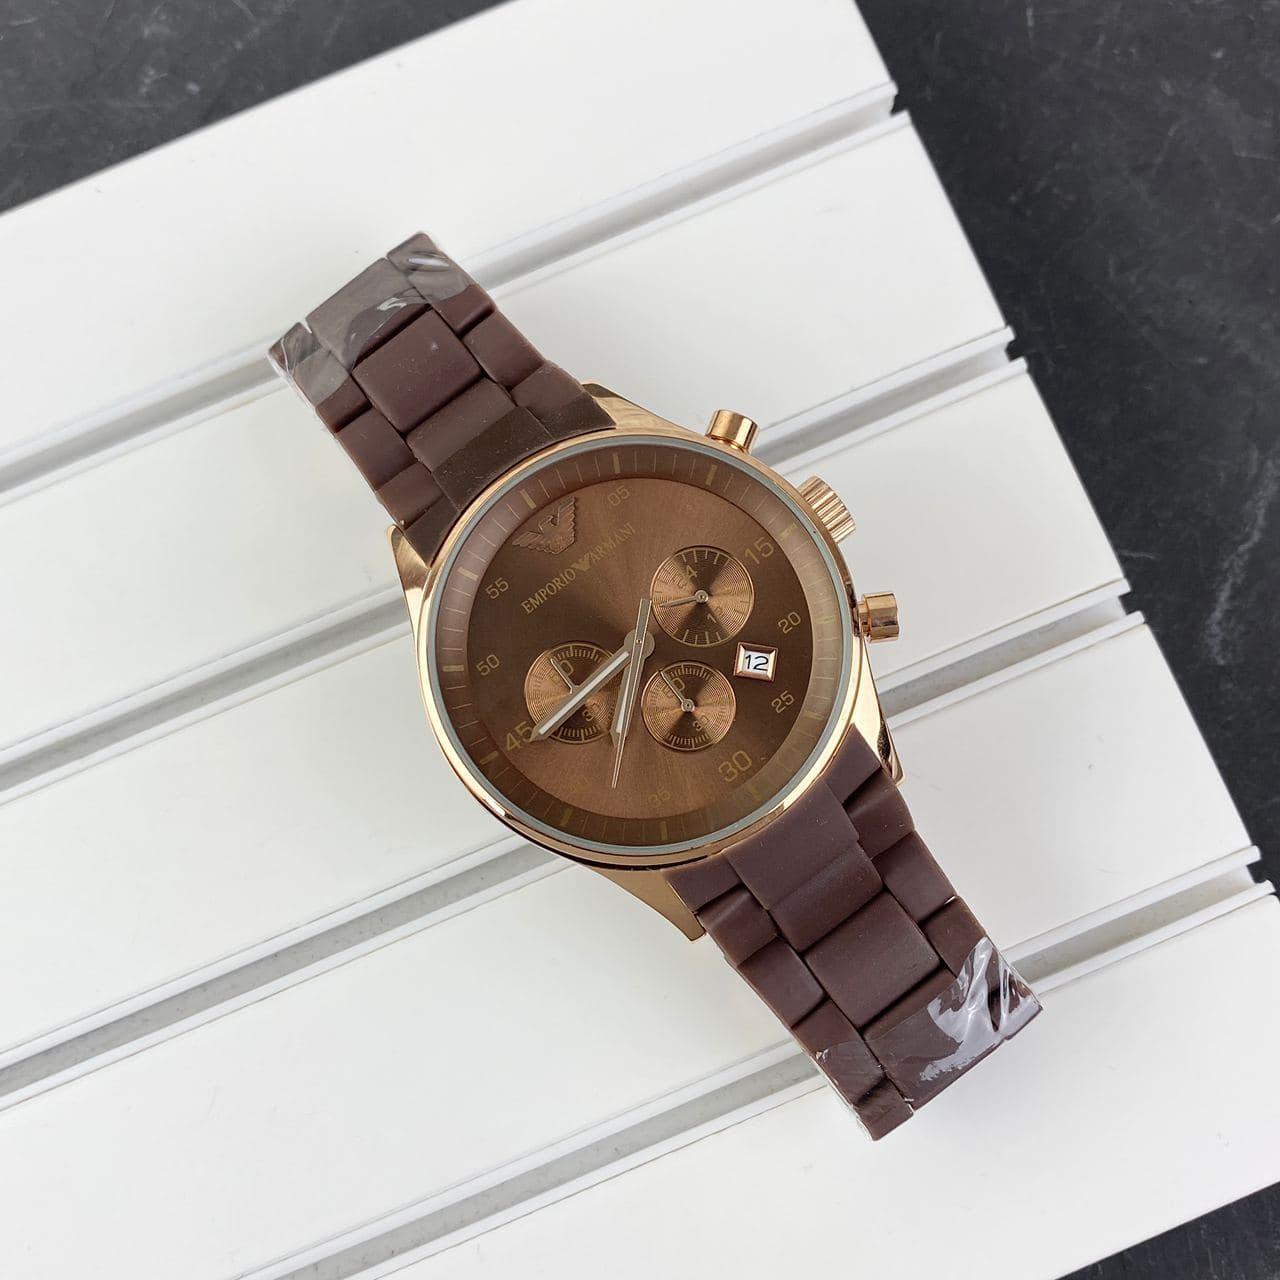 Мужские наручные часы Emporio Armani AR-5905 Gold-Brown Silicone